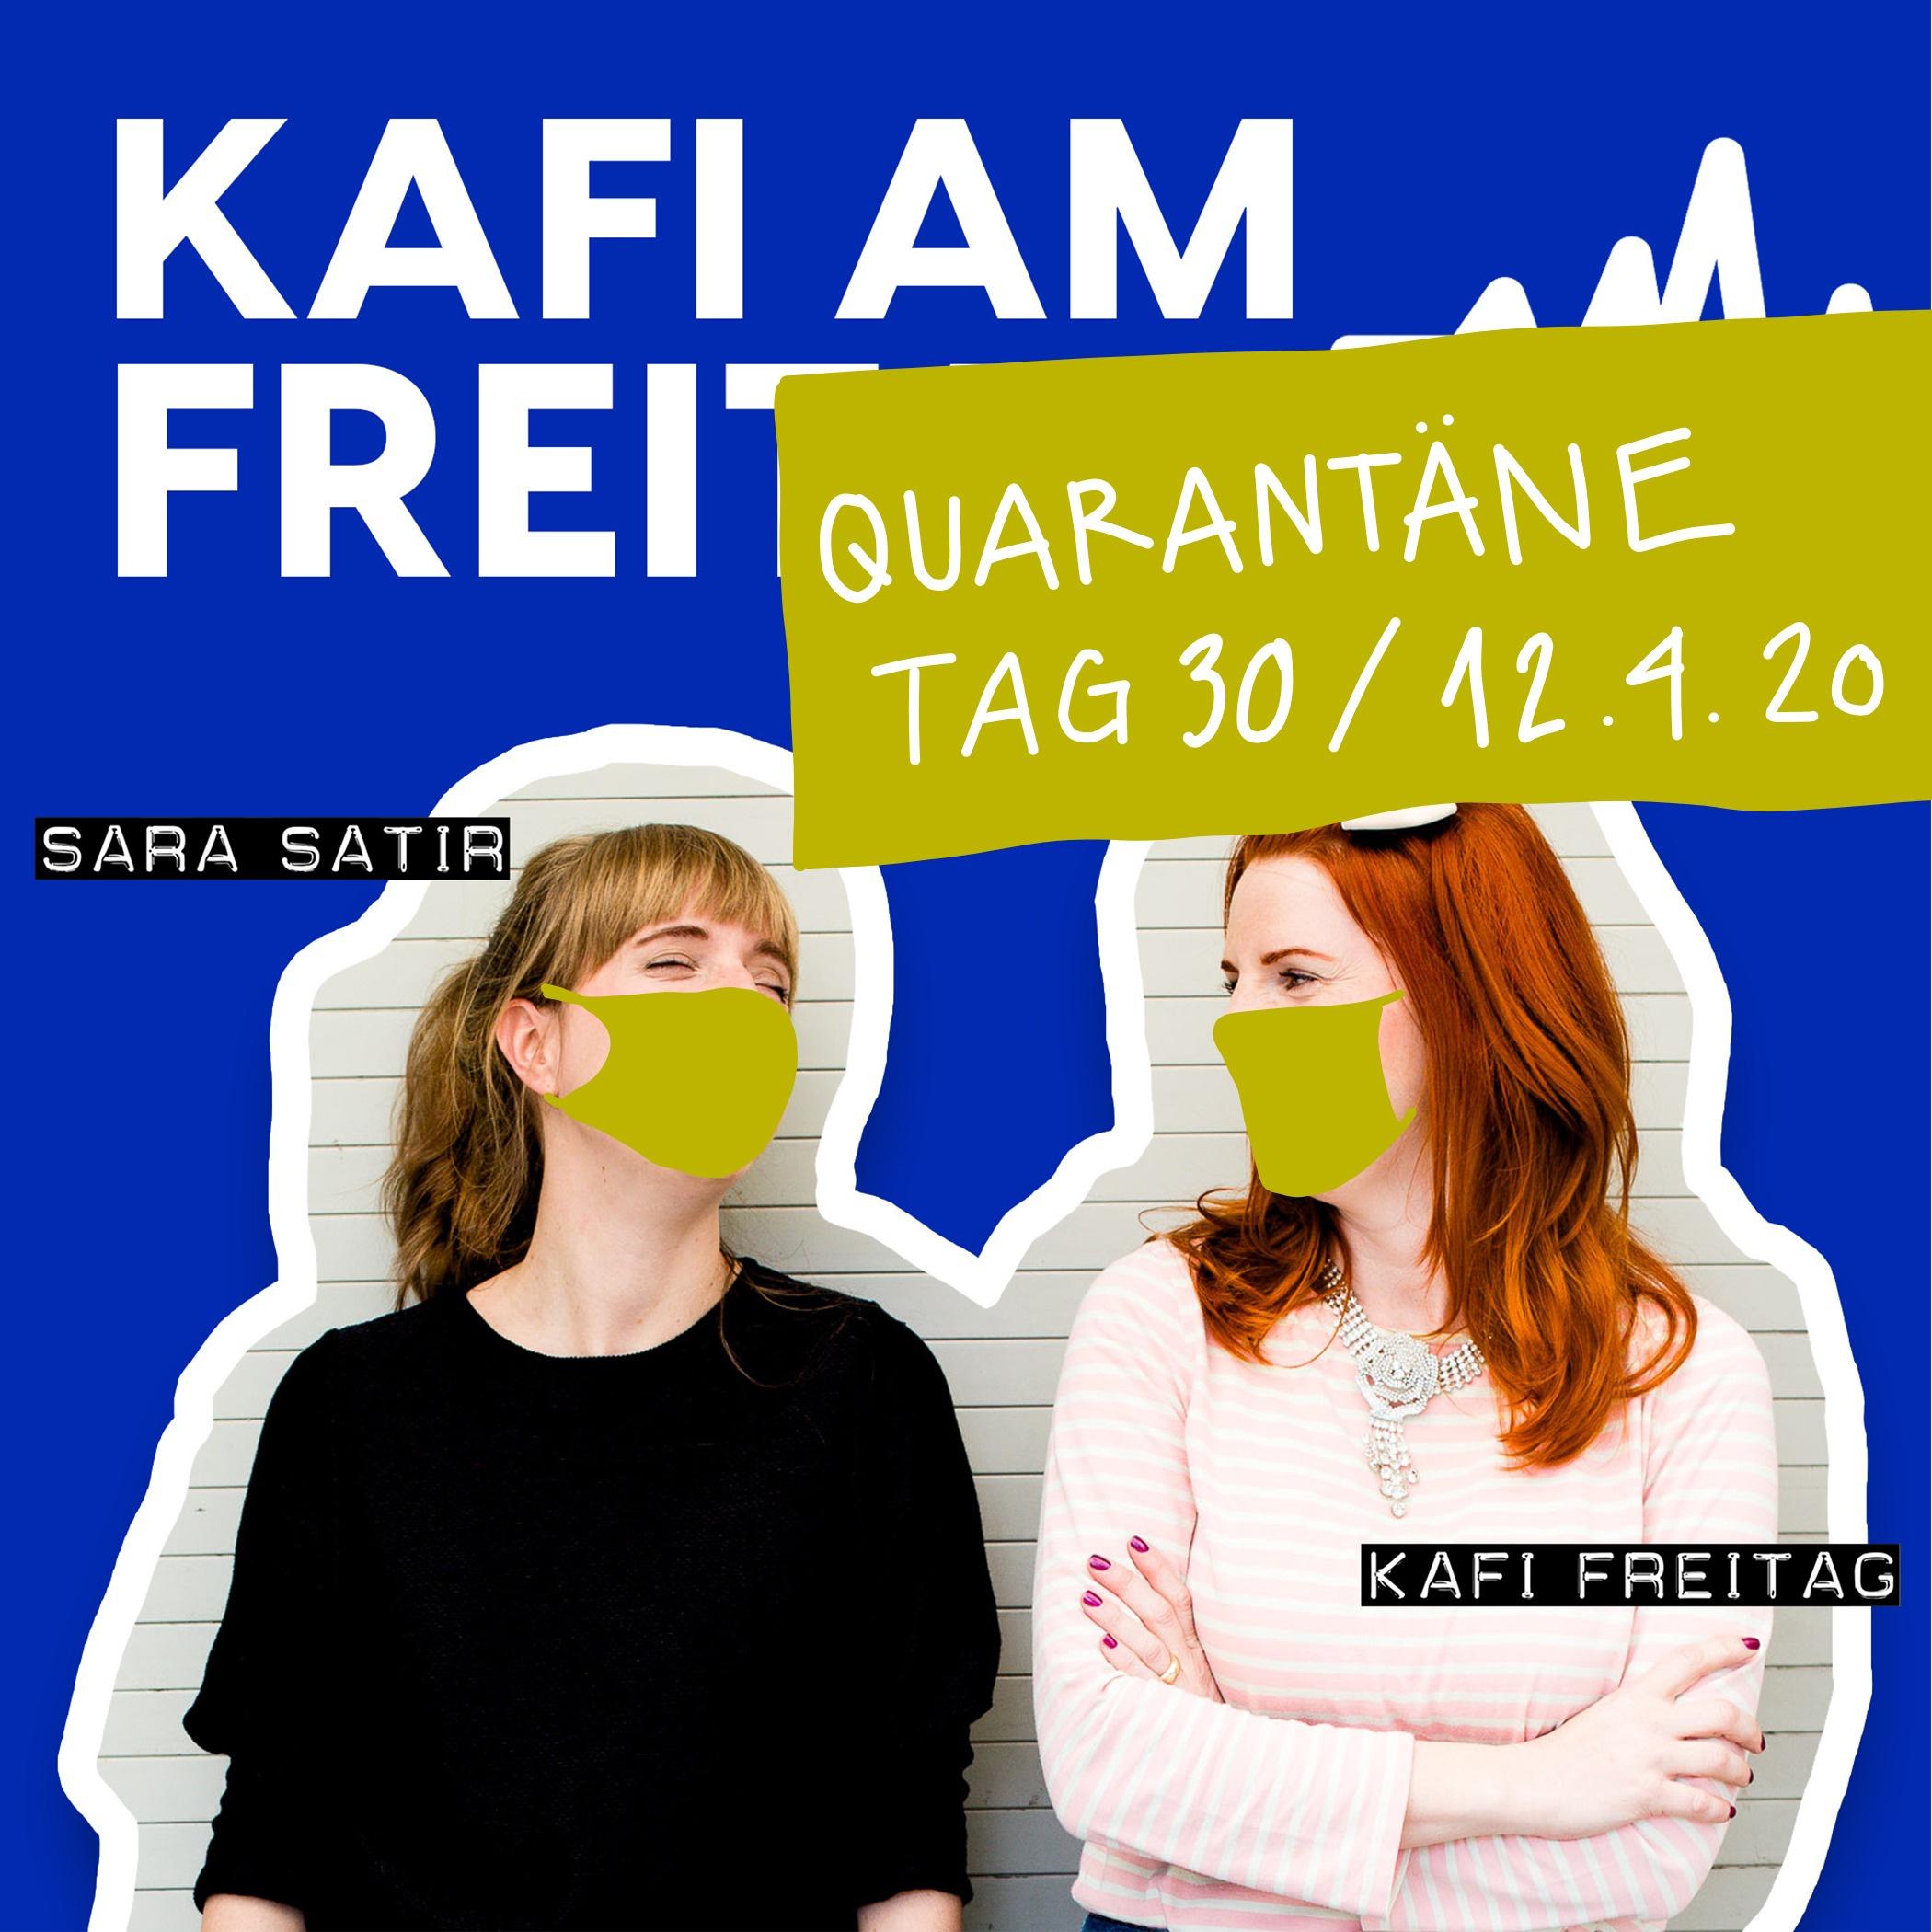 Quarantäne Tag 30 - 12.4.20